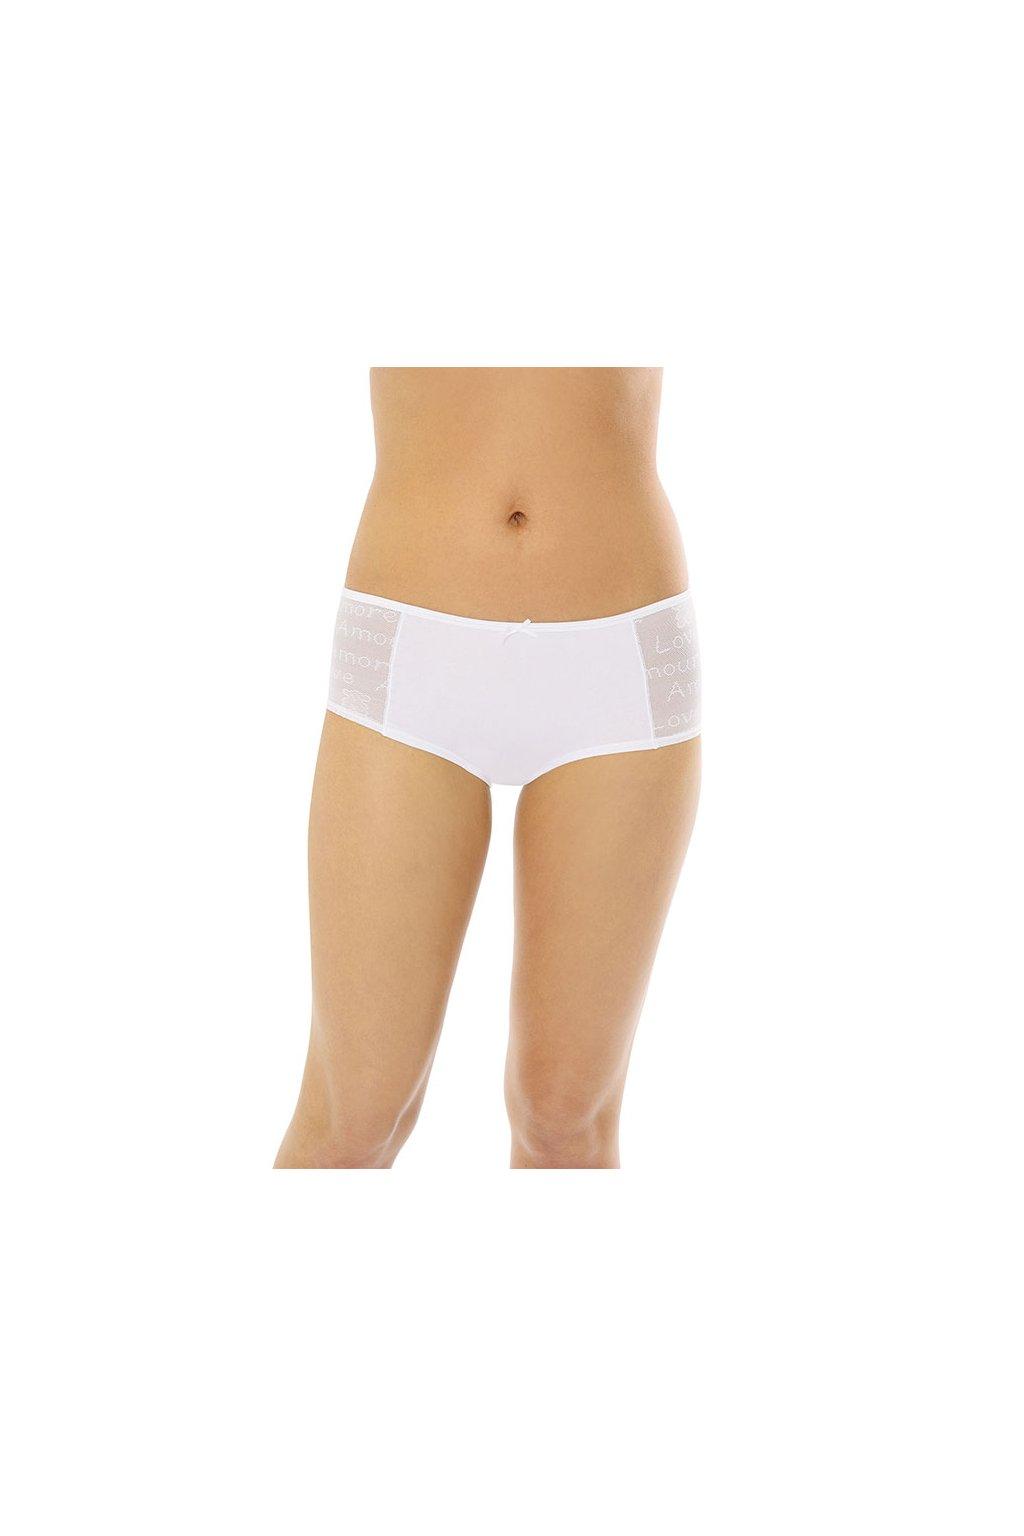 Dámské kalhotky, 100173 1, bílá